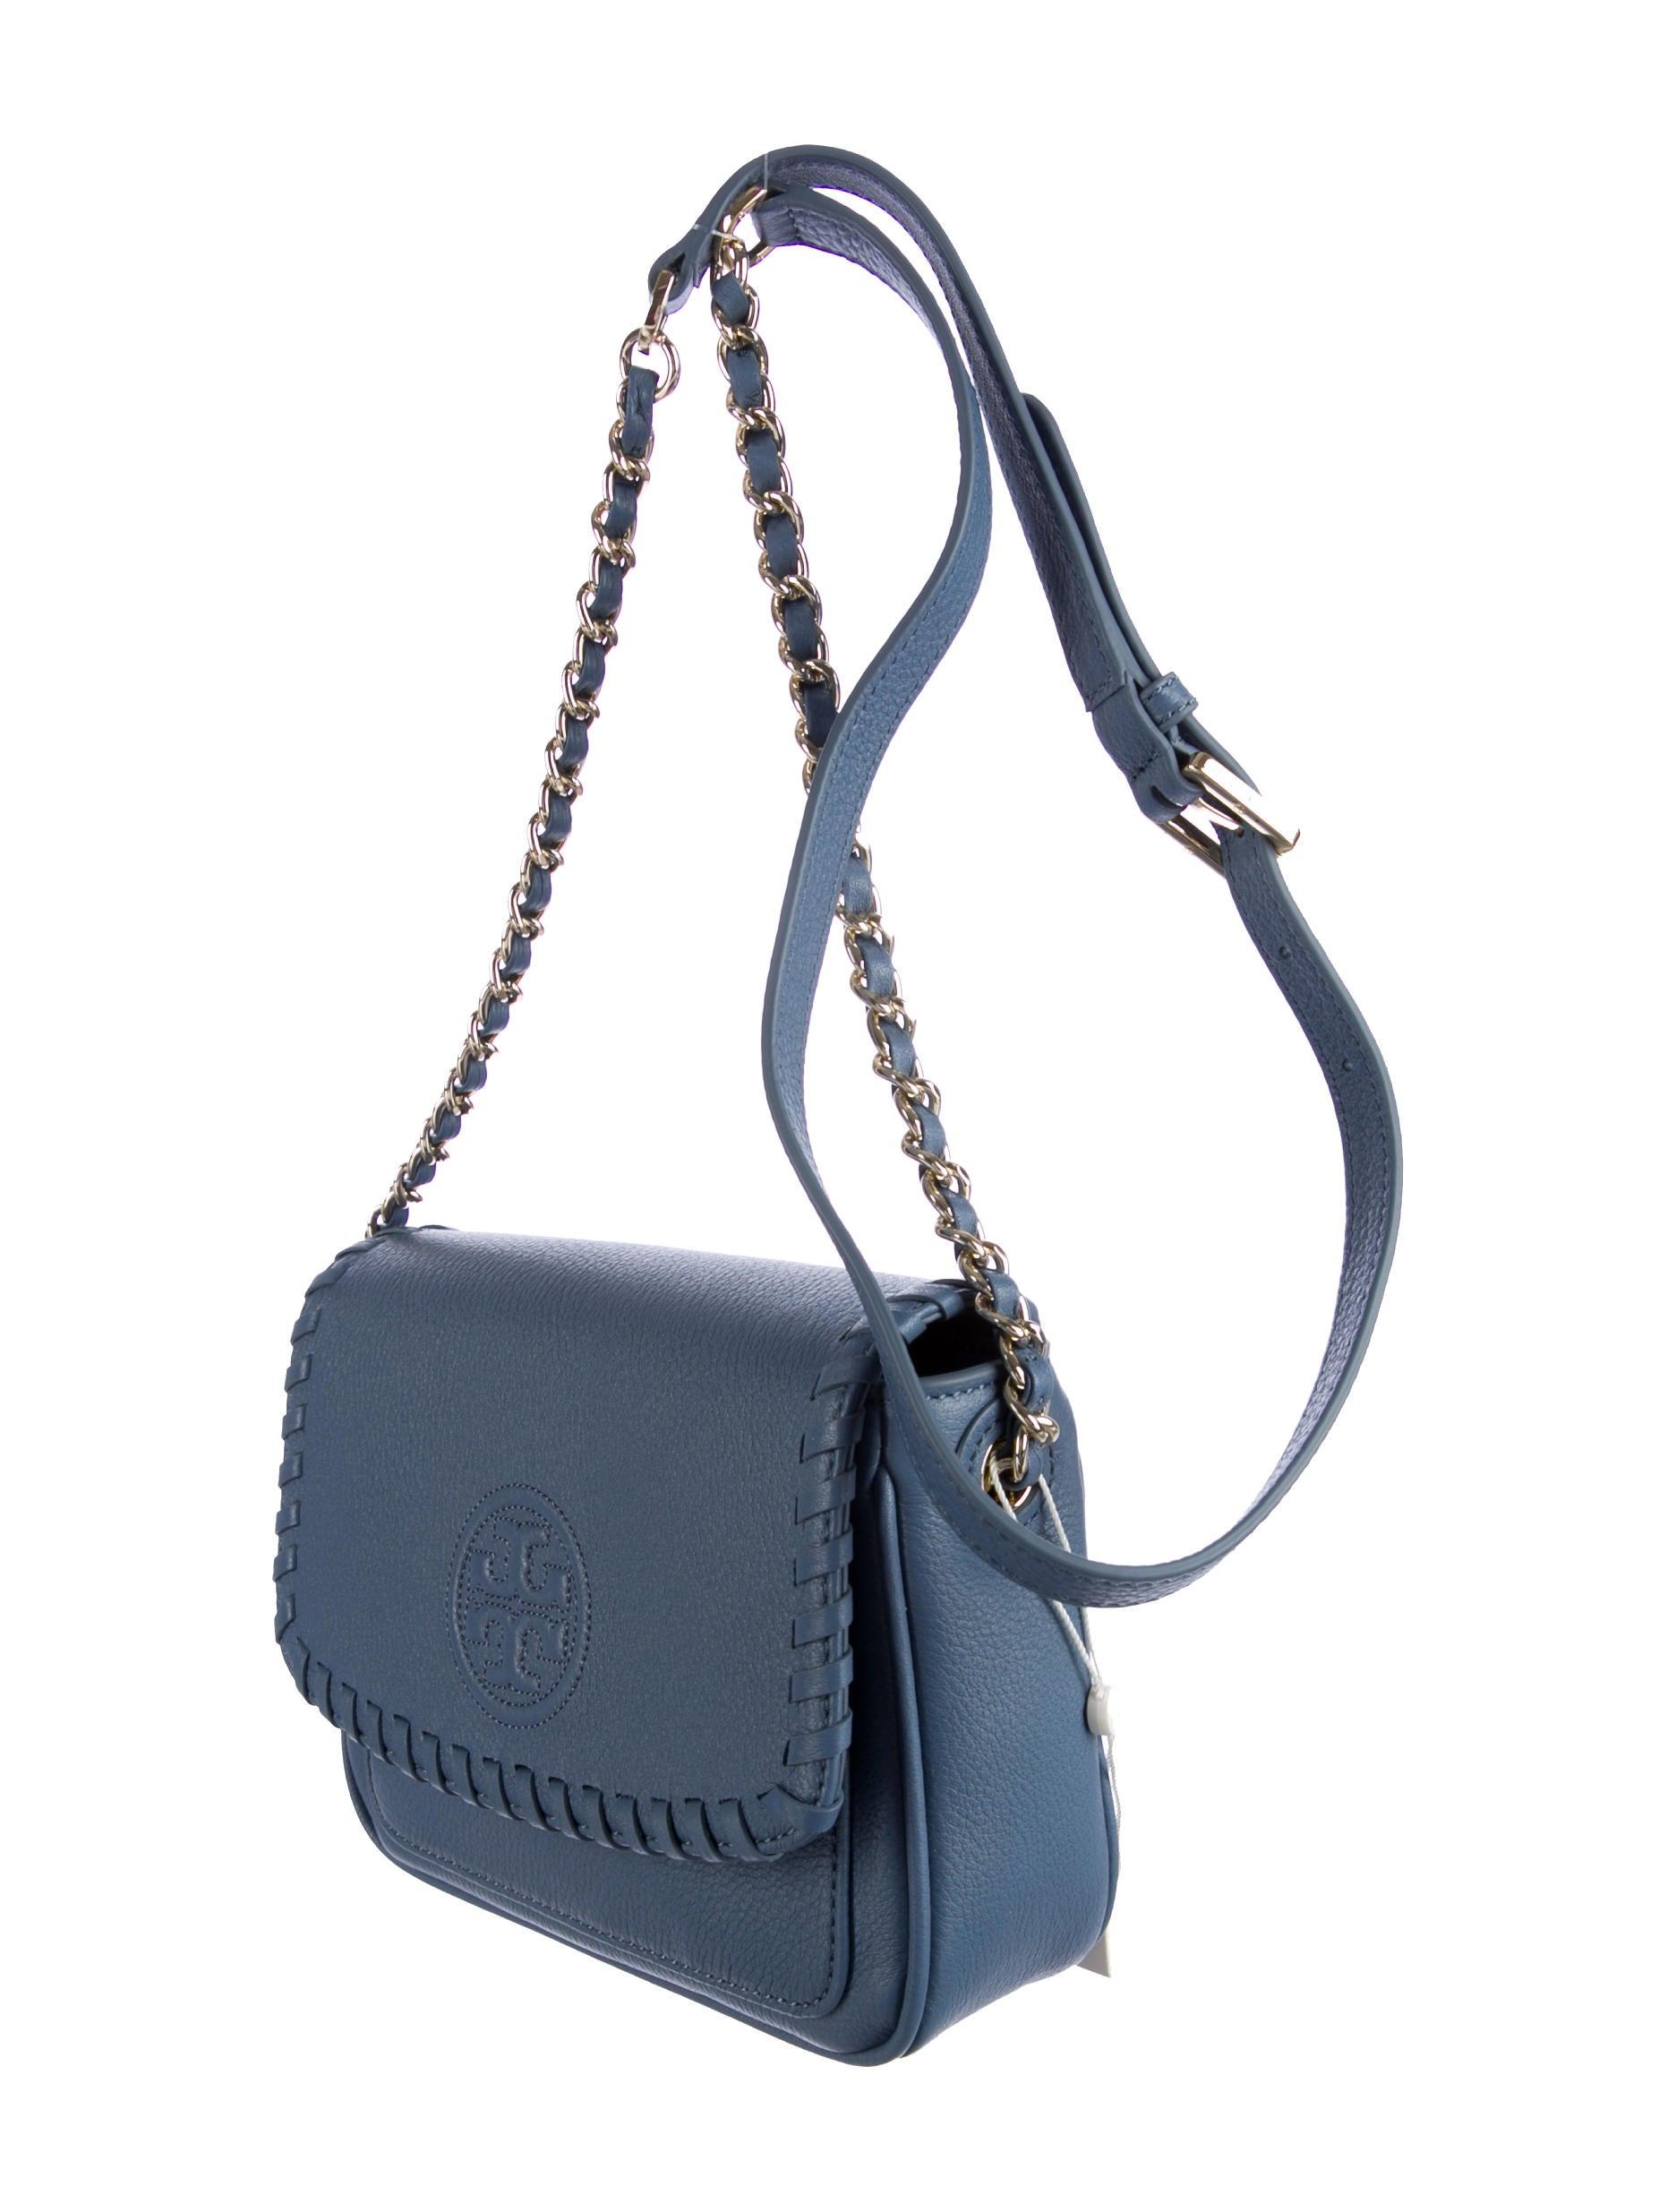 Tory Burch Marion Mini Bag w/ Tags - Handbags - WTO49739 | The ...